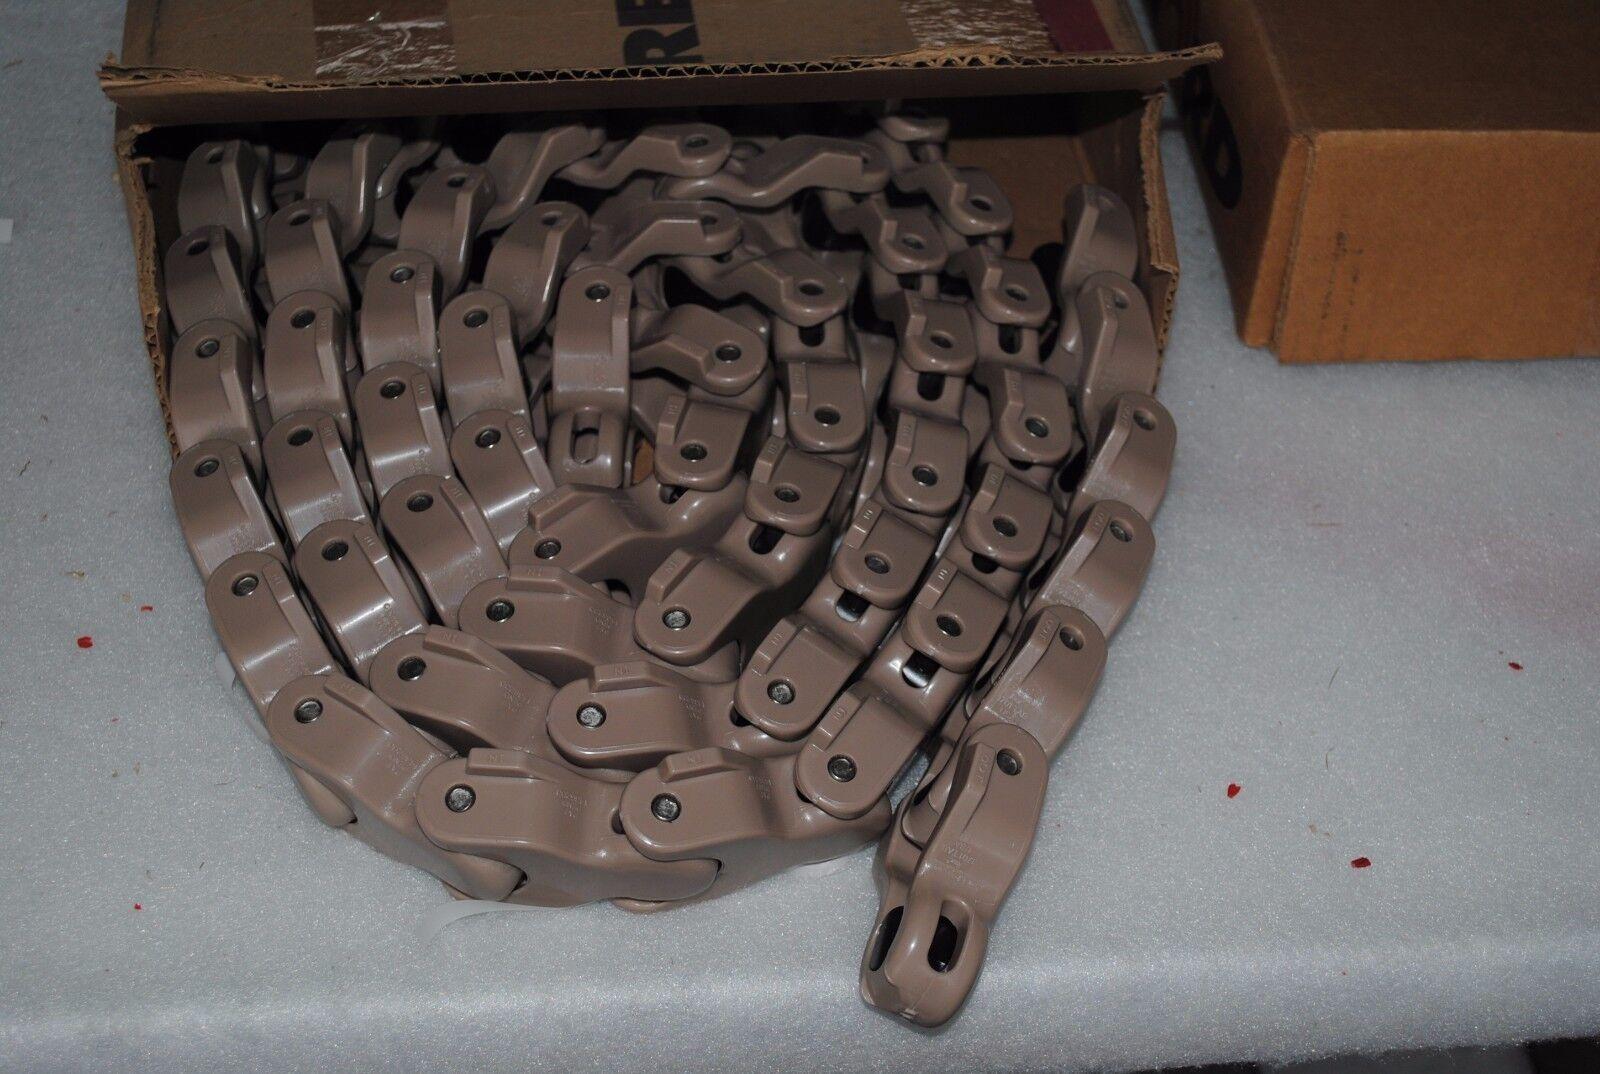 Rexnord Tabletop chain/förderkette m) lf1701tab (10 ft = Environ 3 m) chain/förderkette 7240e5